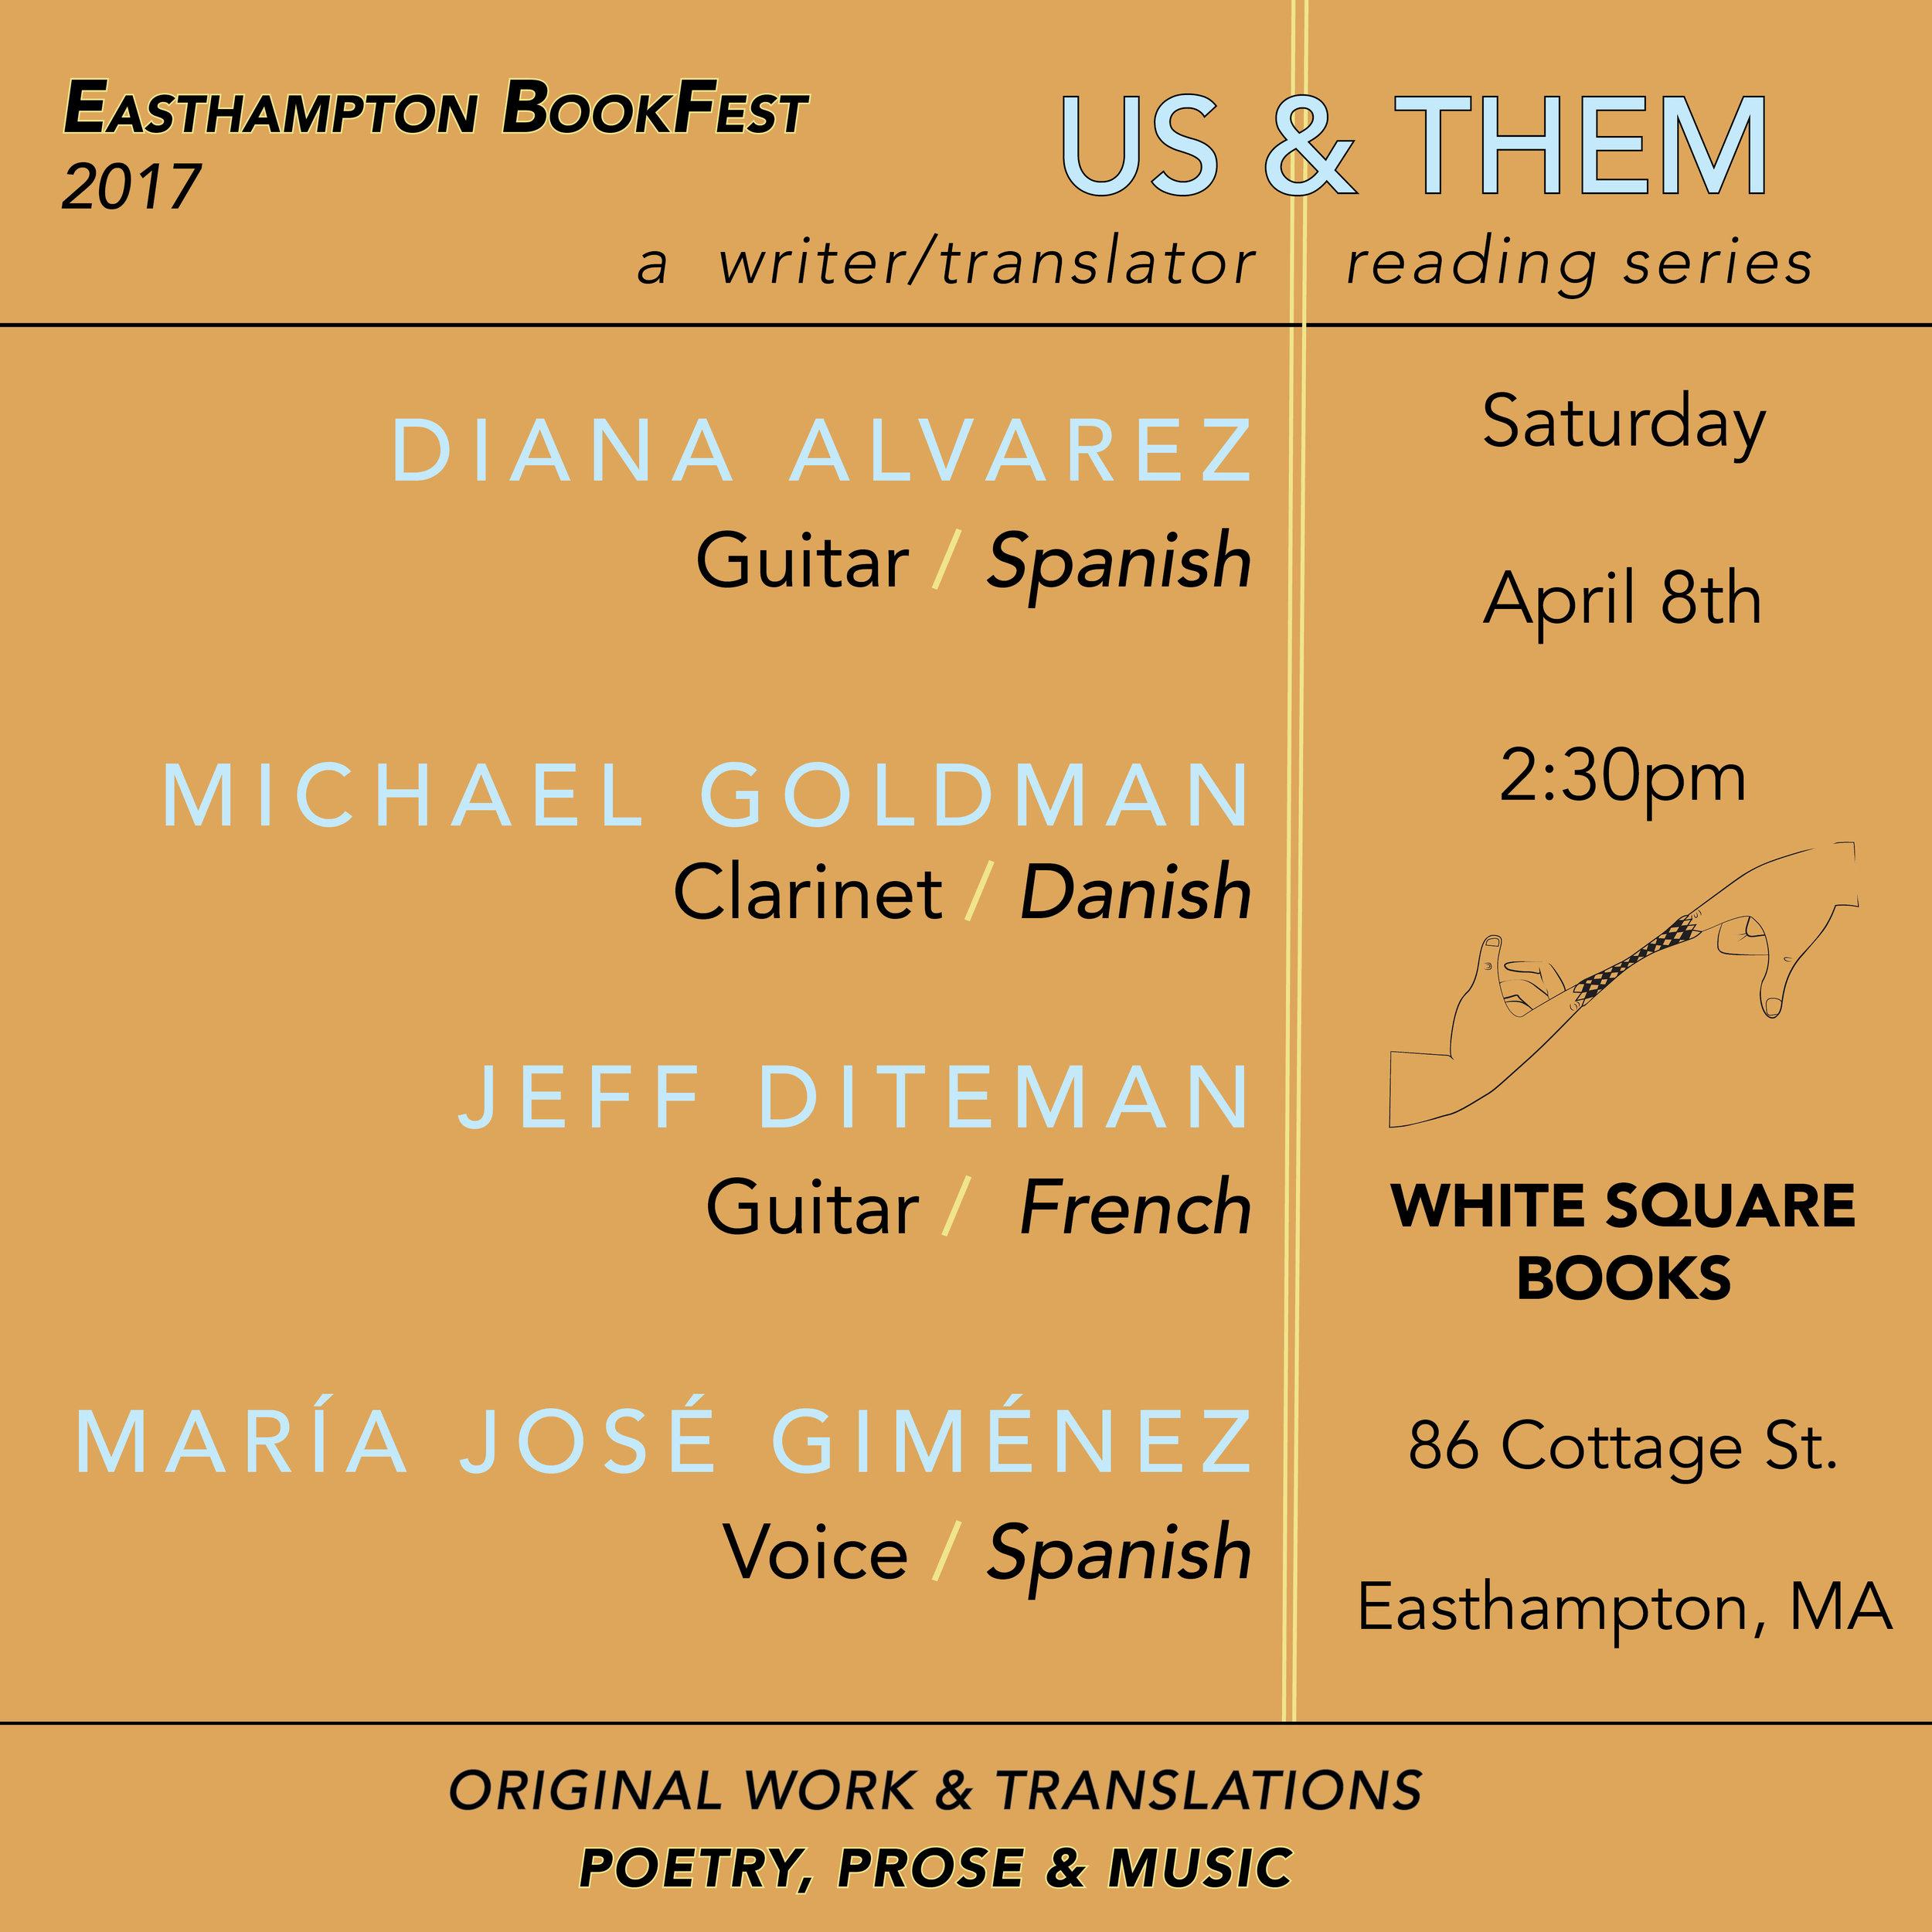 2017 East Hampton_Us&Them flyer_r2.jpg